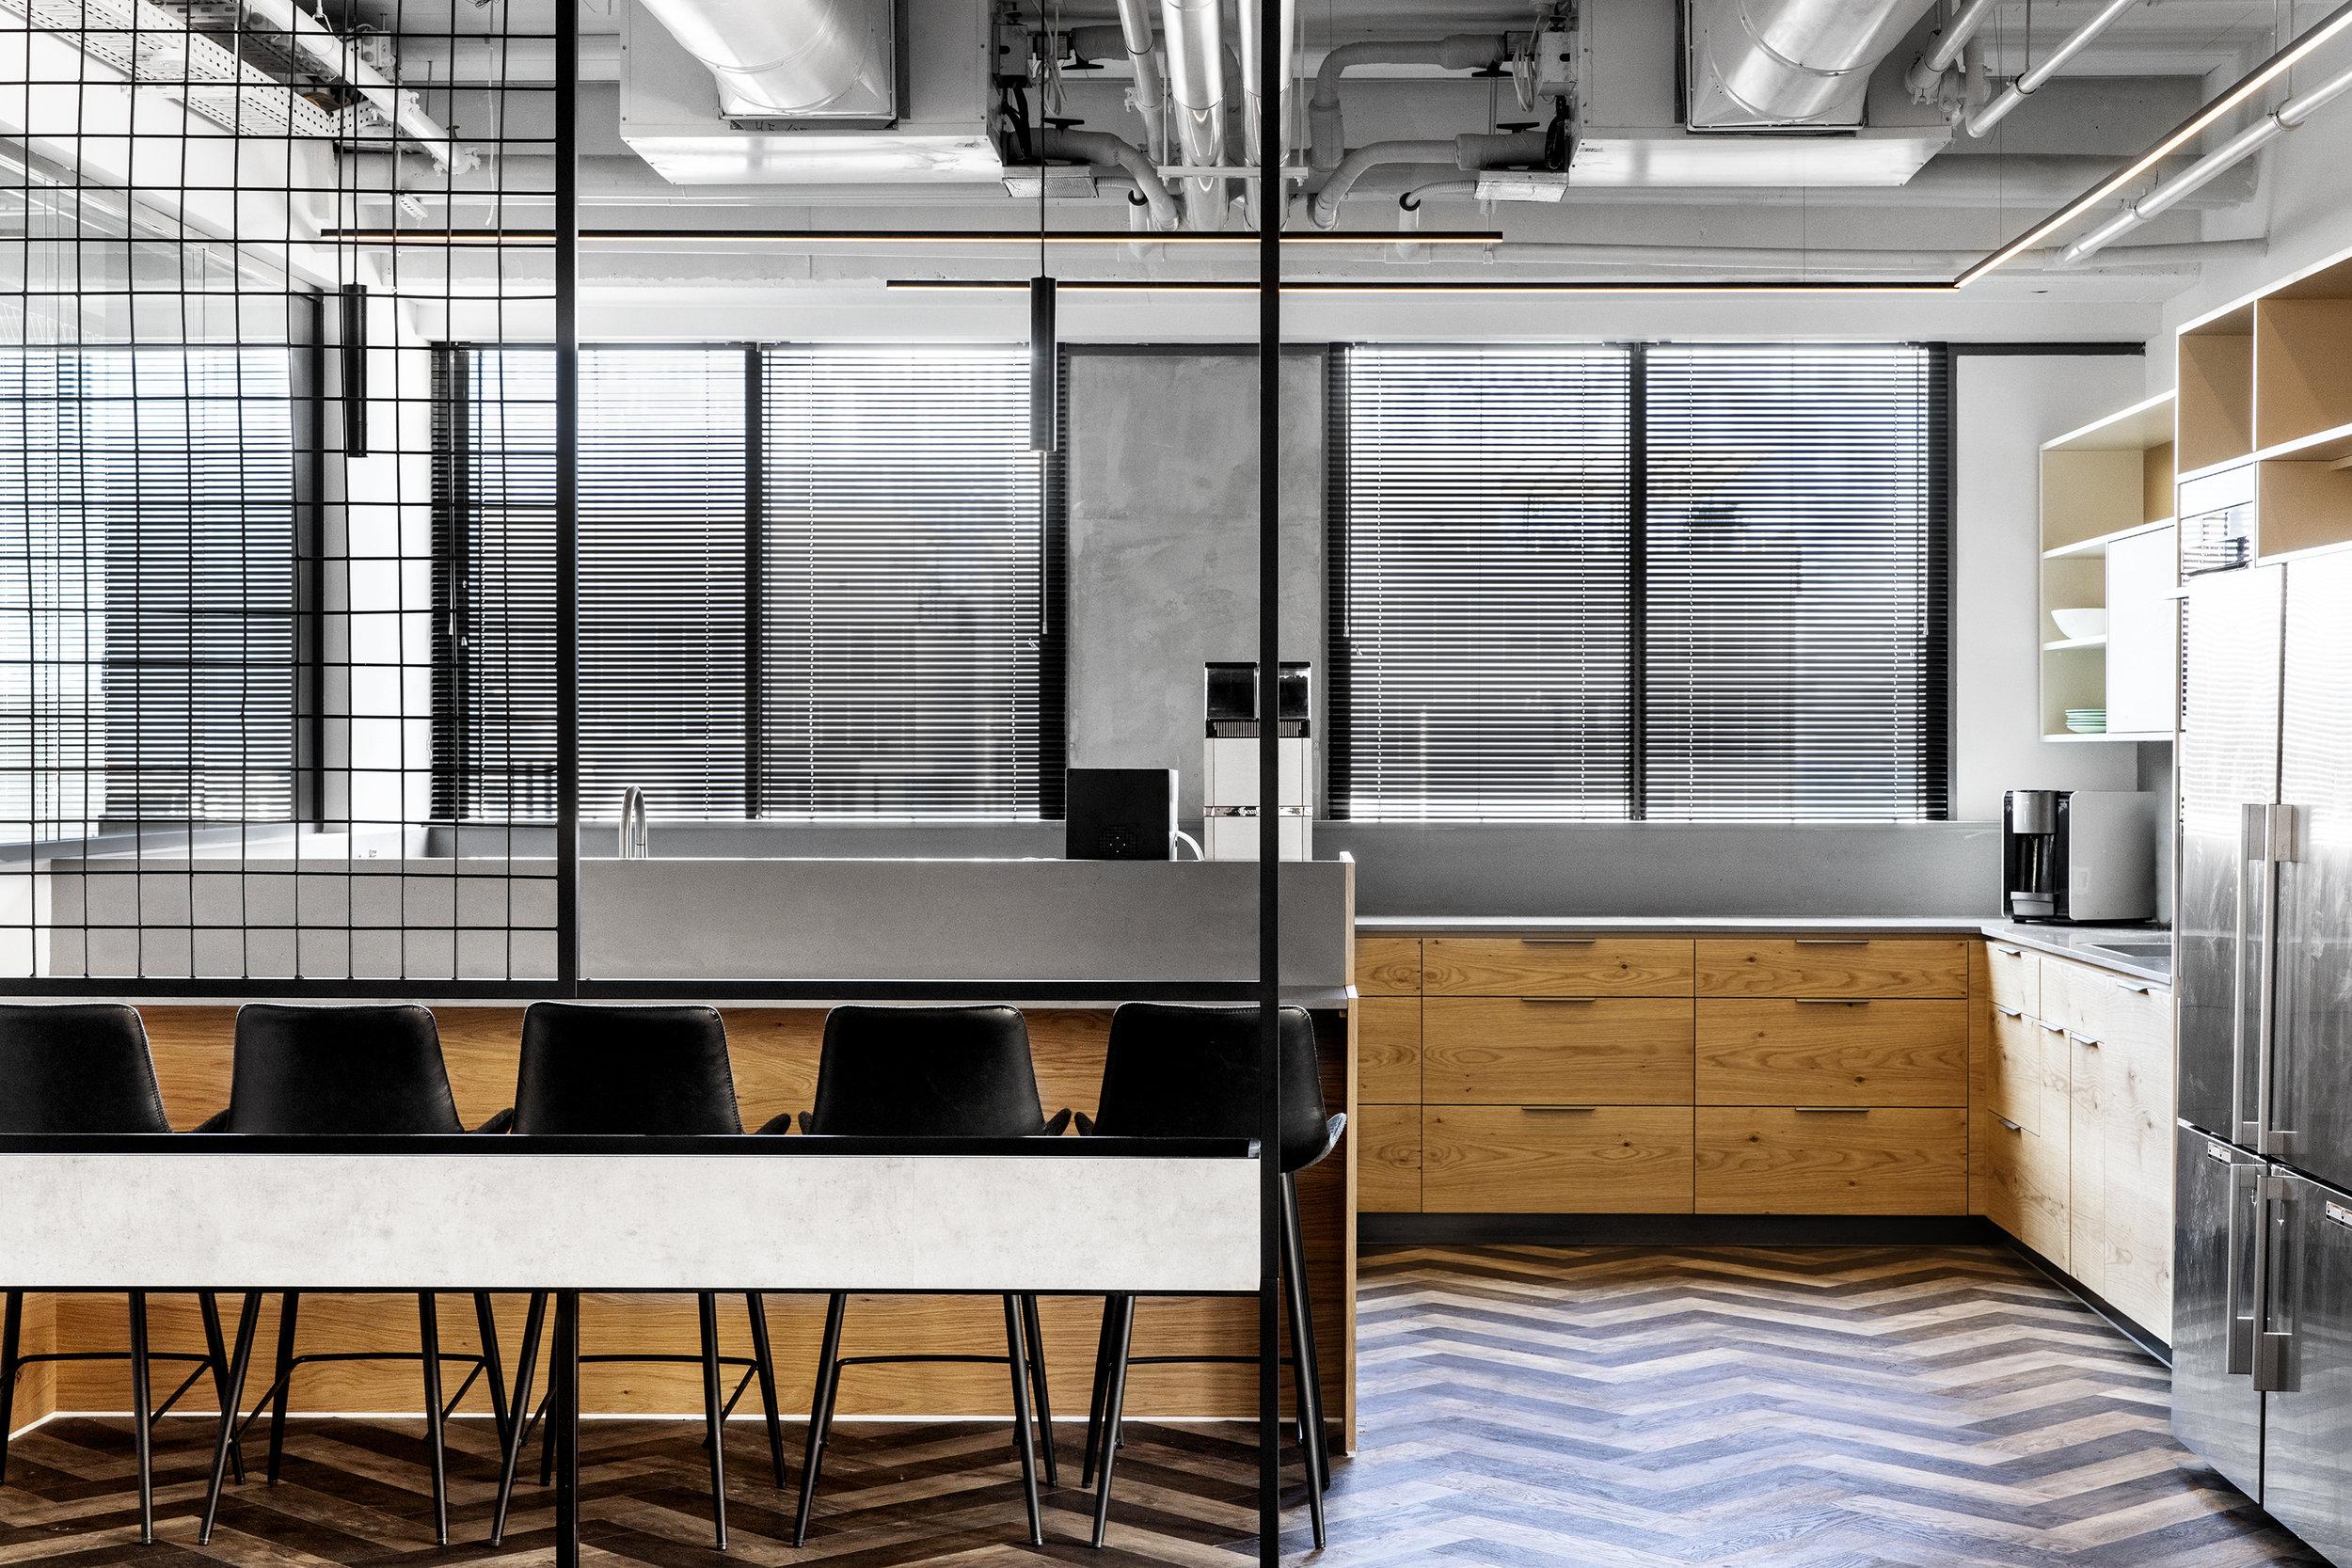 R2NET OFFICES - ROY DAVID ARCHITECTURE  STUDIO - רואי דוד אדריכלות סטודיו אדריכלים - אר2נט (27).jpg